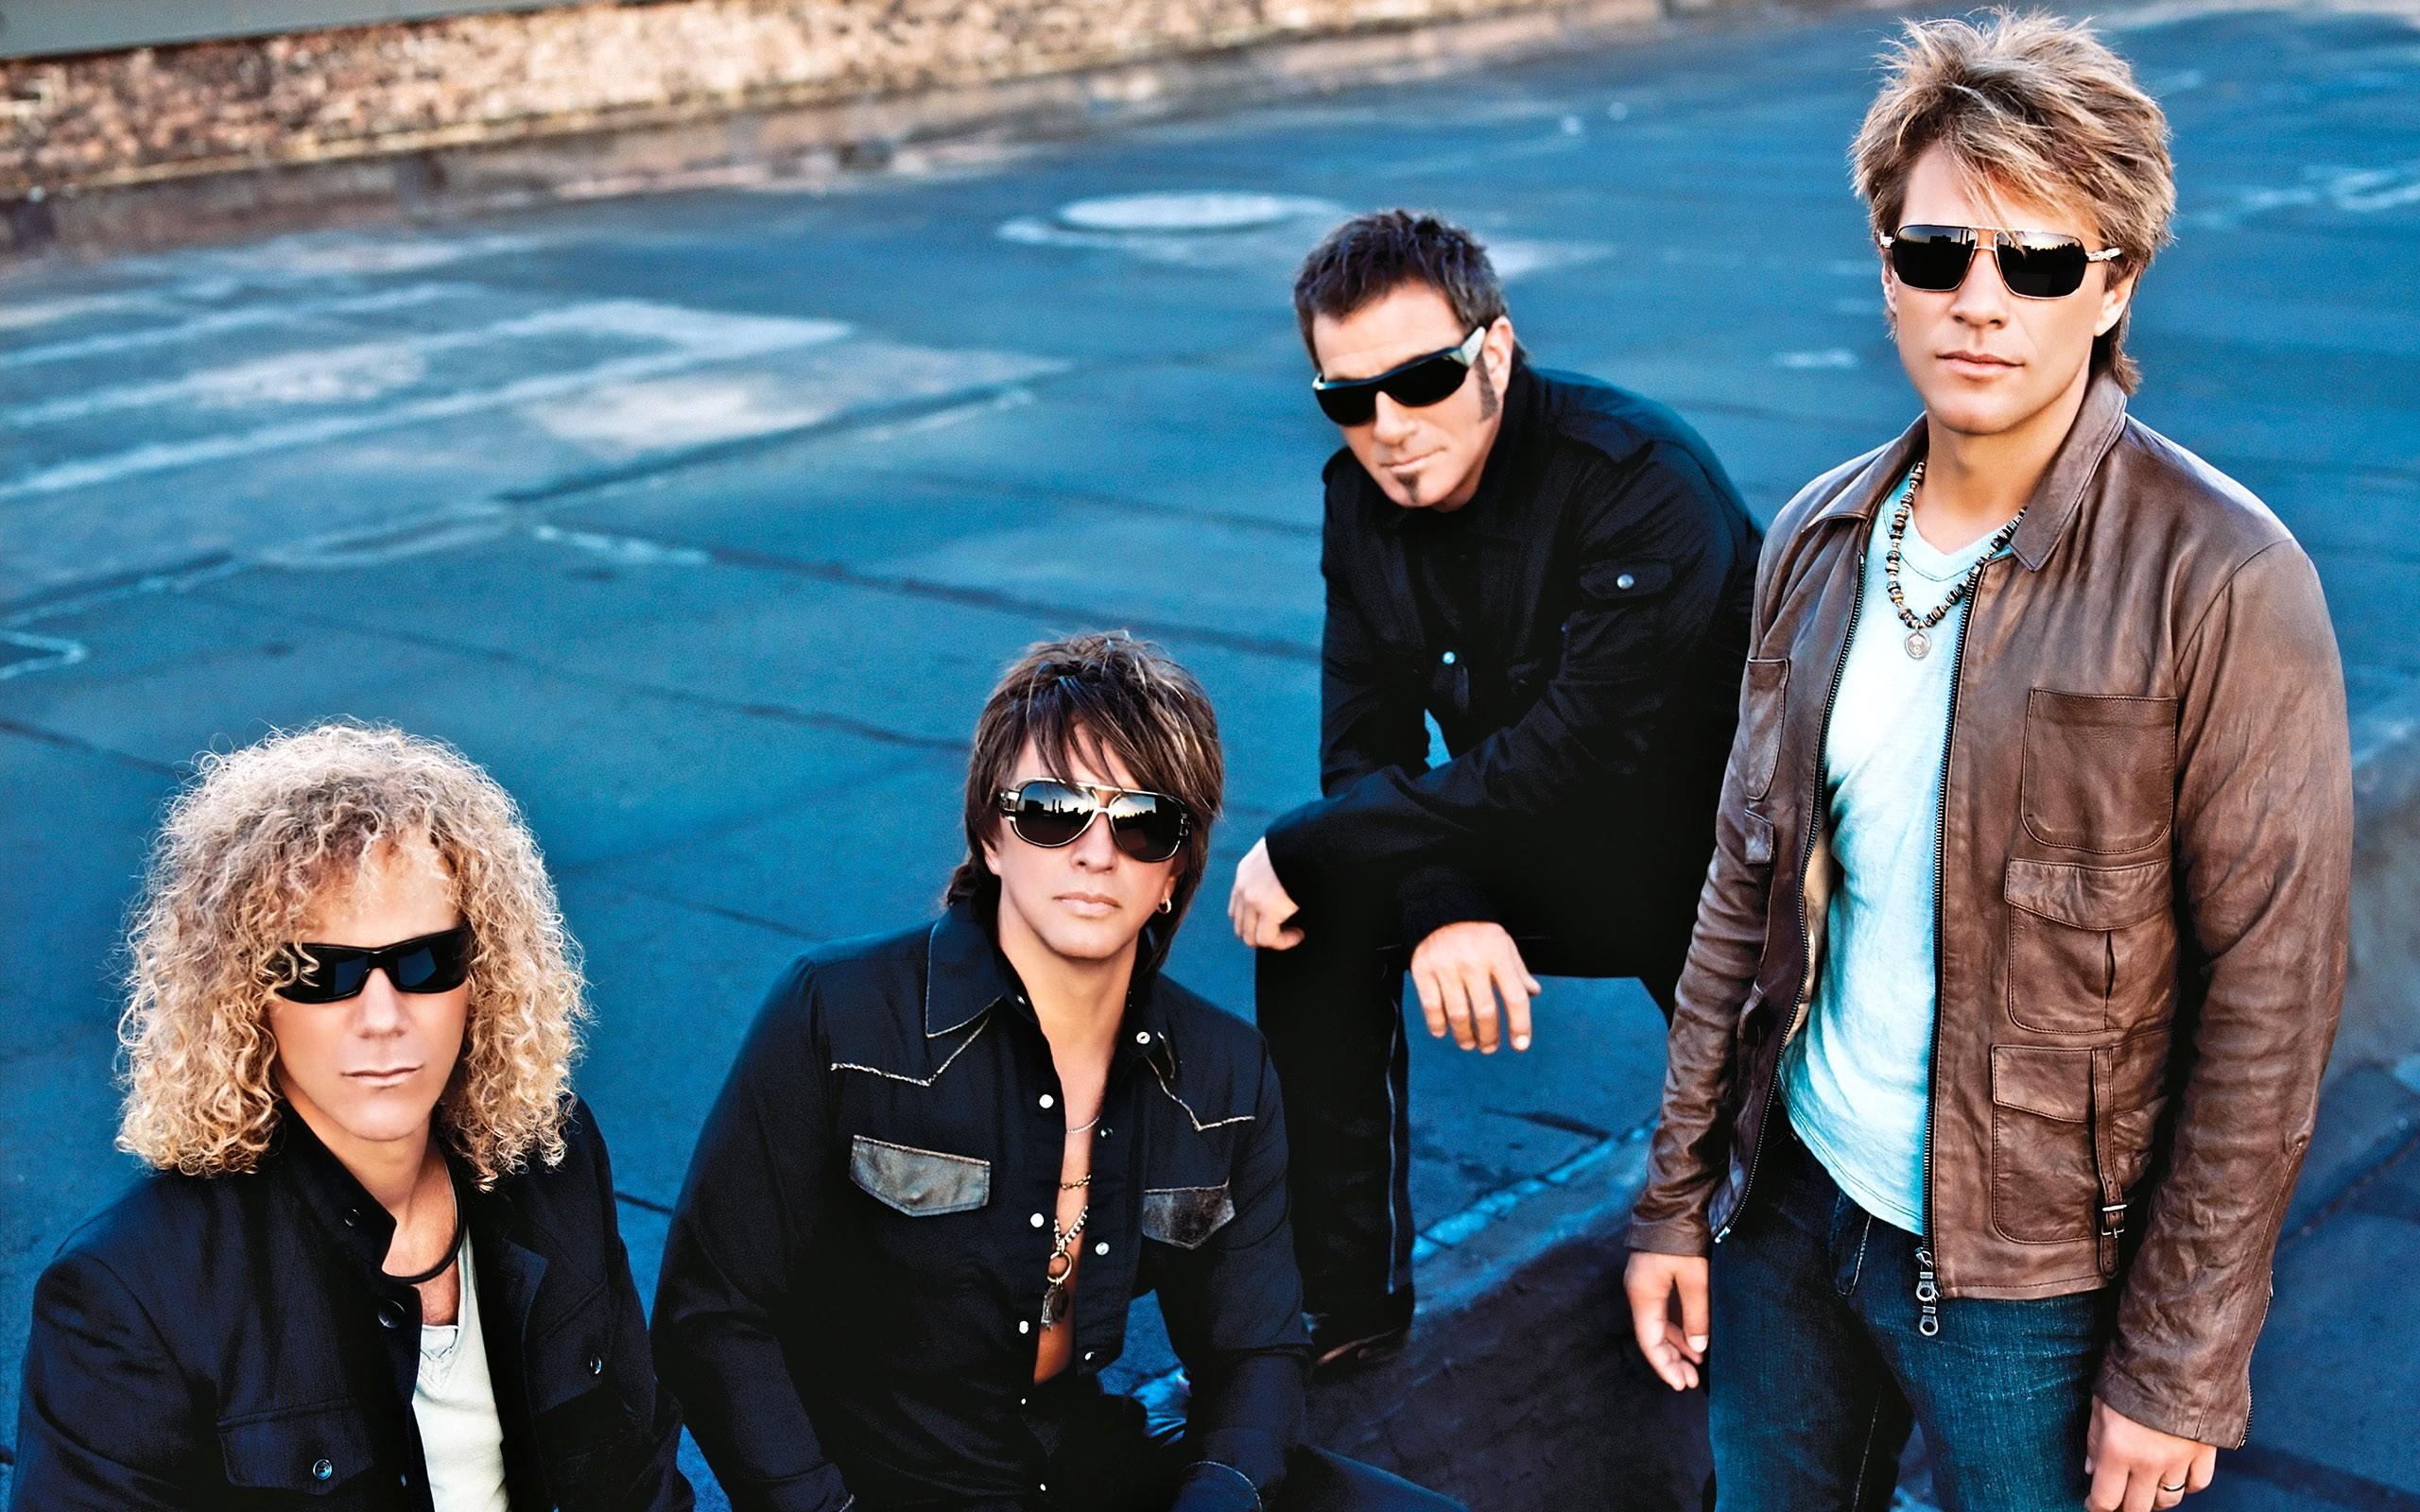 La banda de Bon Jovi - 2560x1600